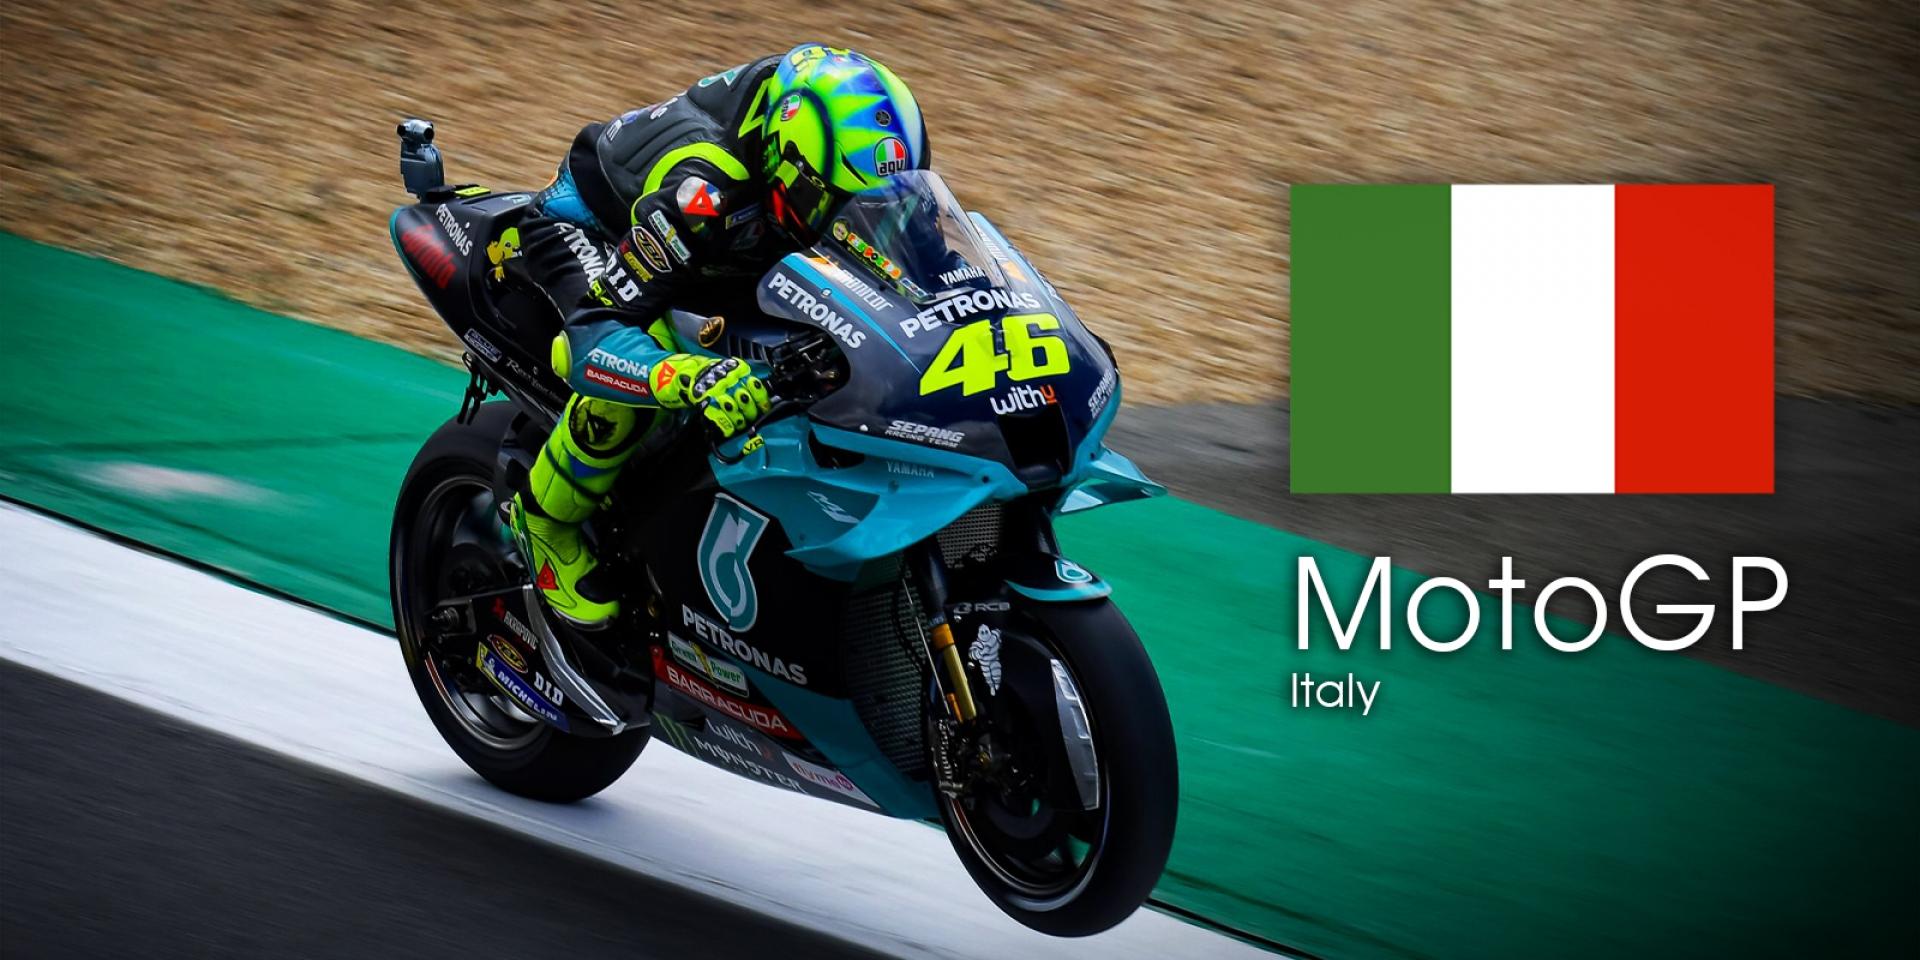 MotoGP 2021 義大利站 轉播時間